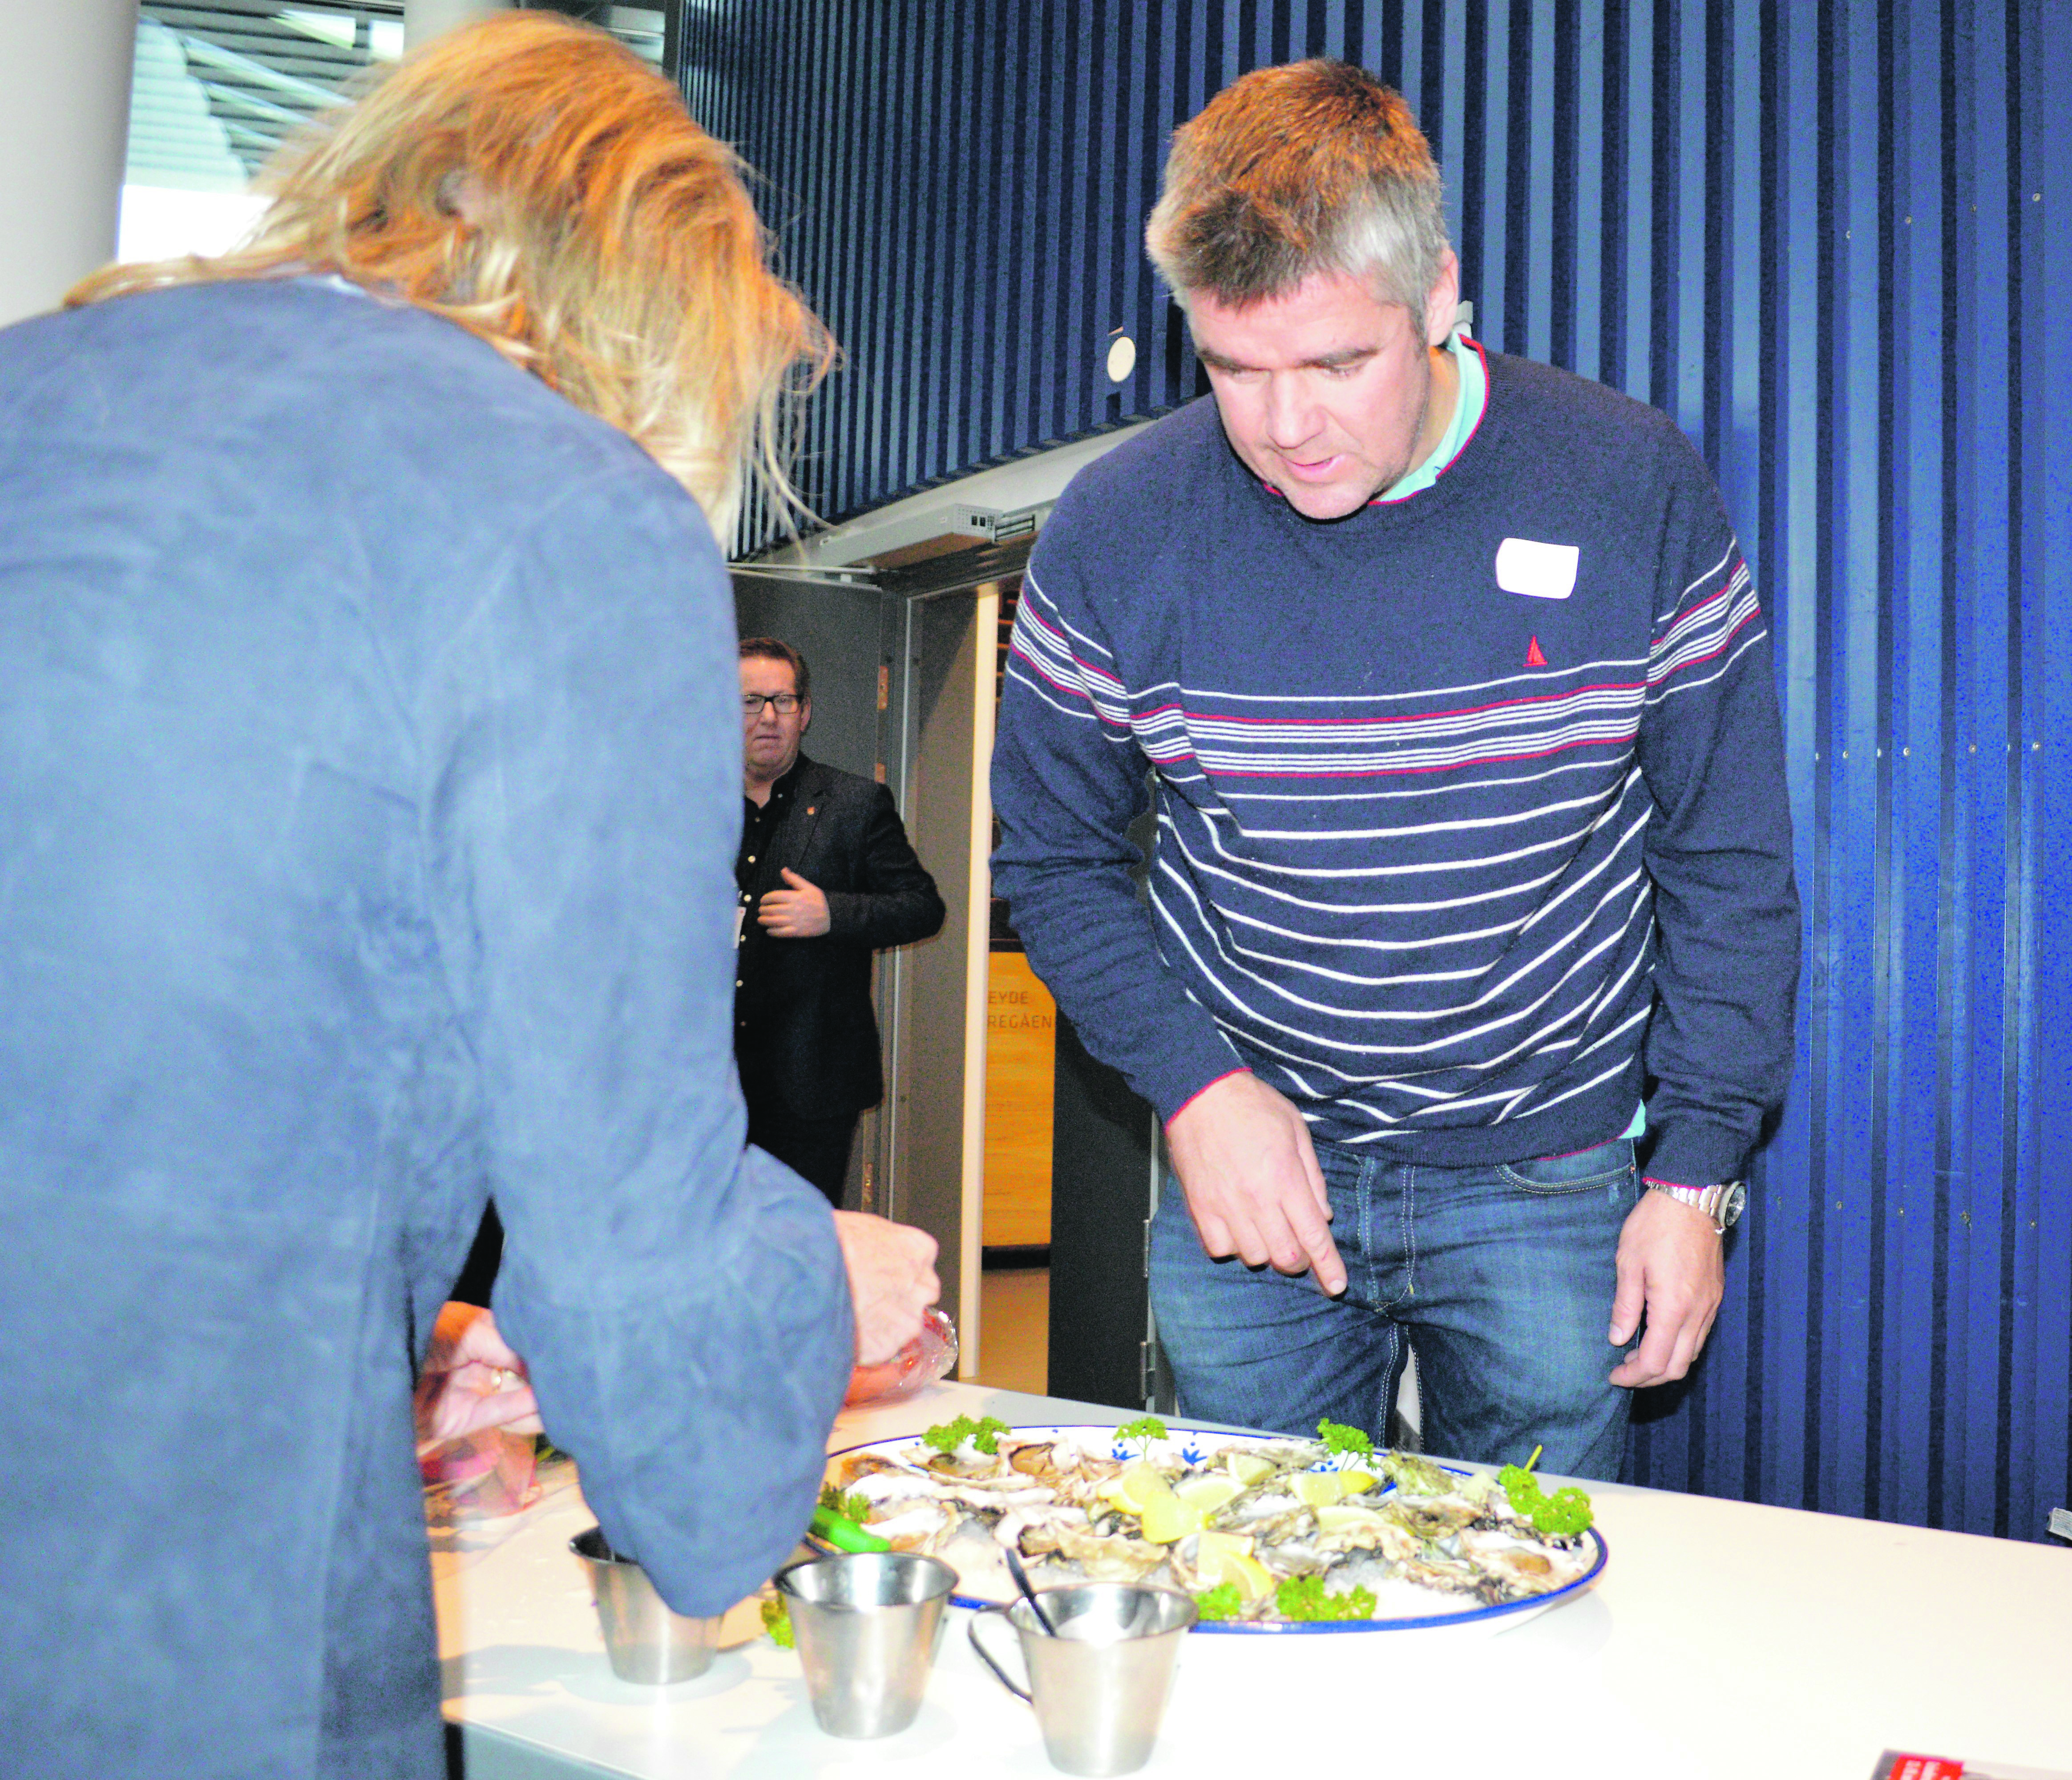 SMAKSPRØVER: Mange Var Interessert I å Smake På østers, Og Espen Bierud Fra Norwegian Shores Delte Ut Smaksprøver.